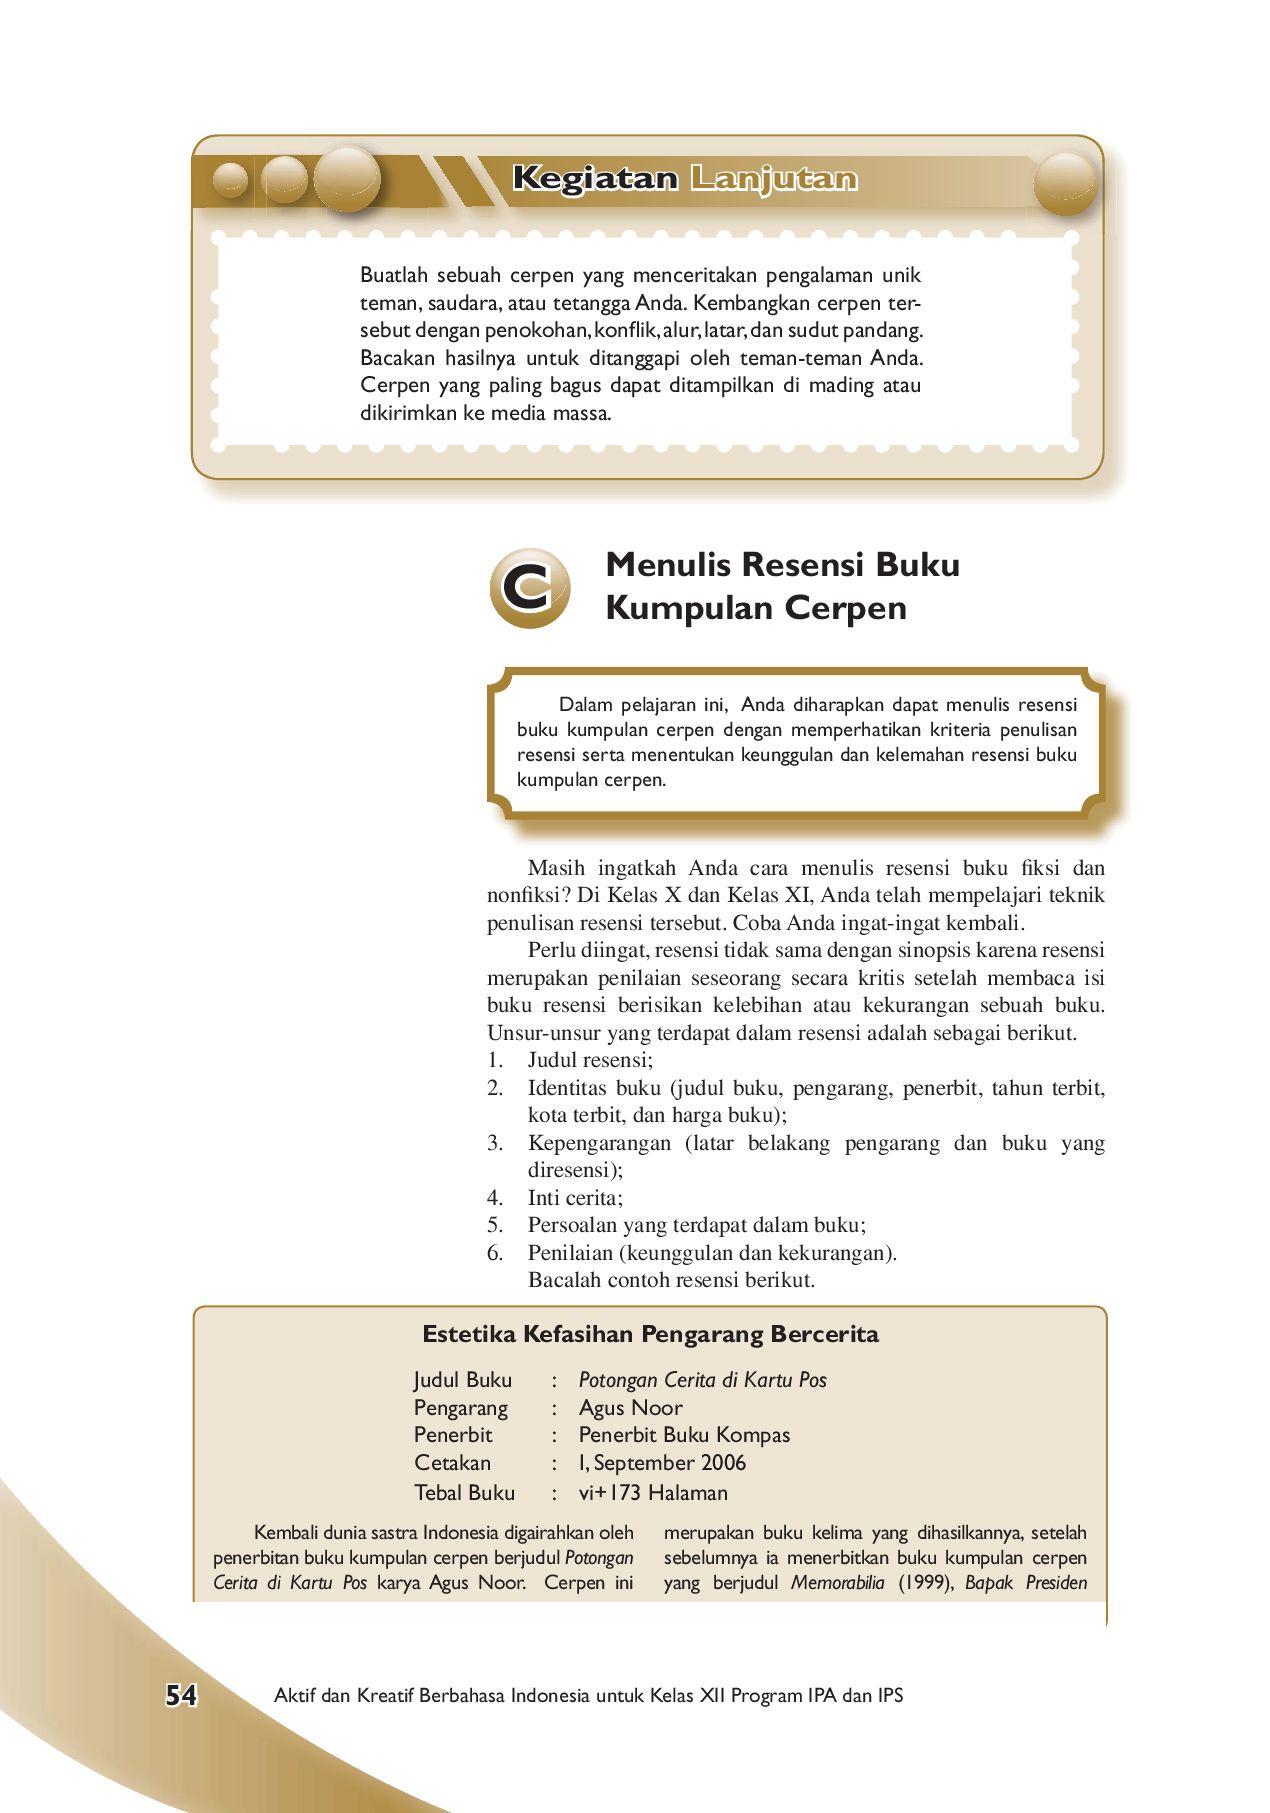 Kelas12 Program Ipa Ips Aktif Dan Kreatif Berbahasa Indonesia Adi